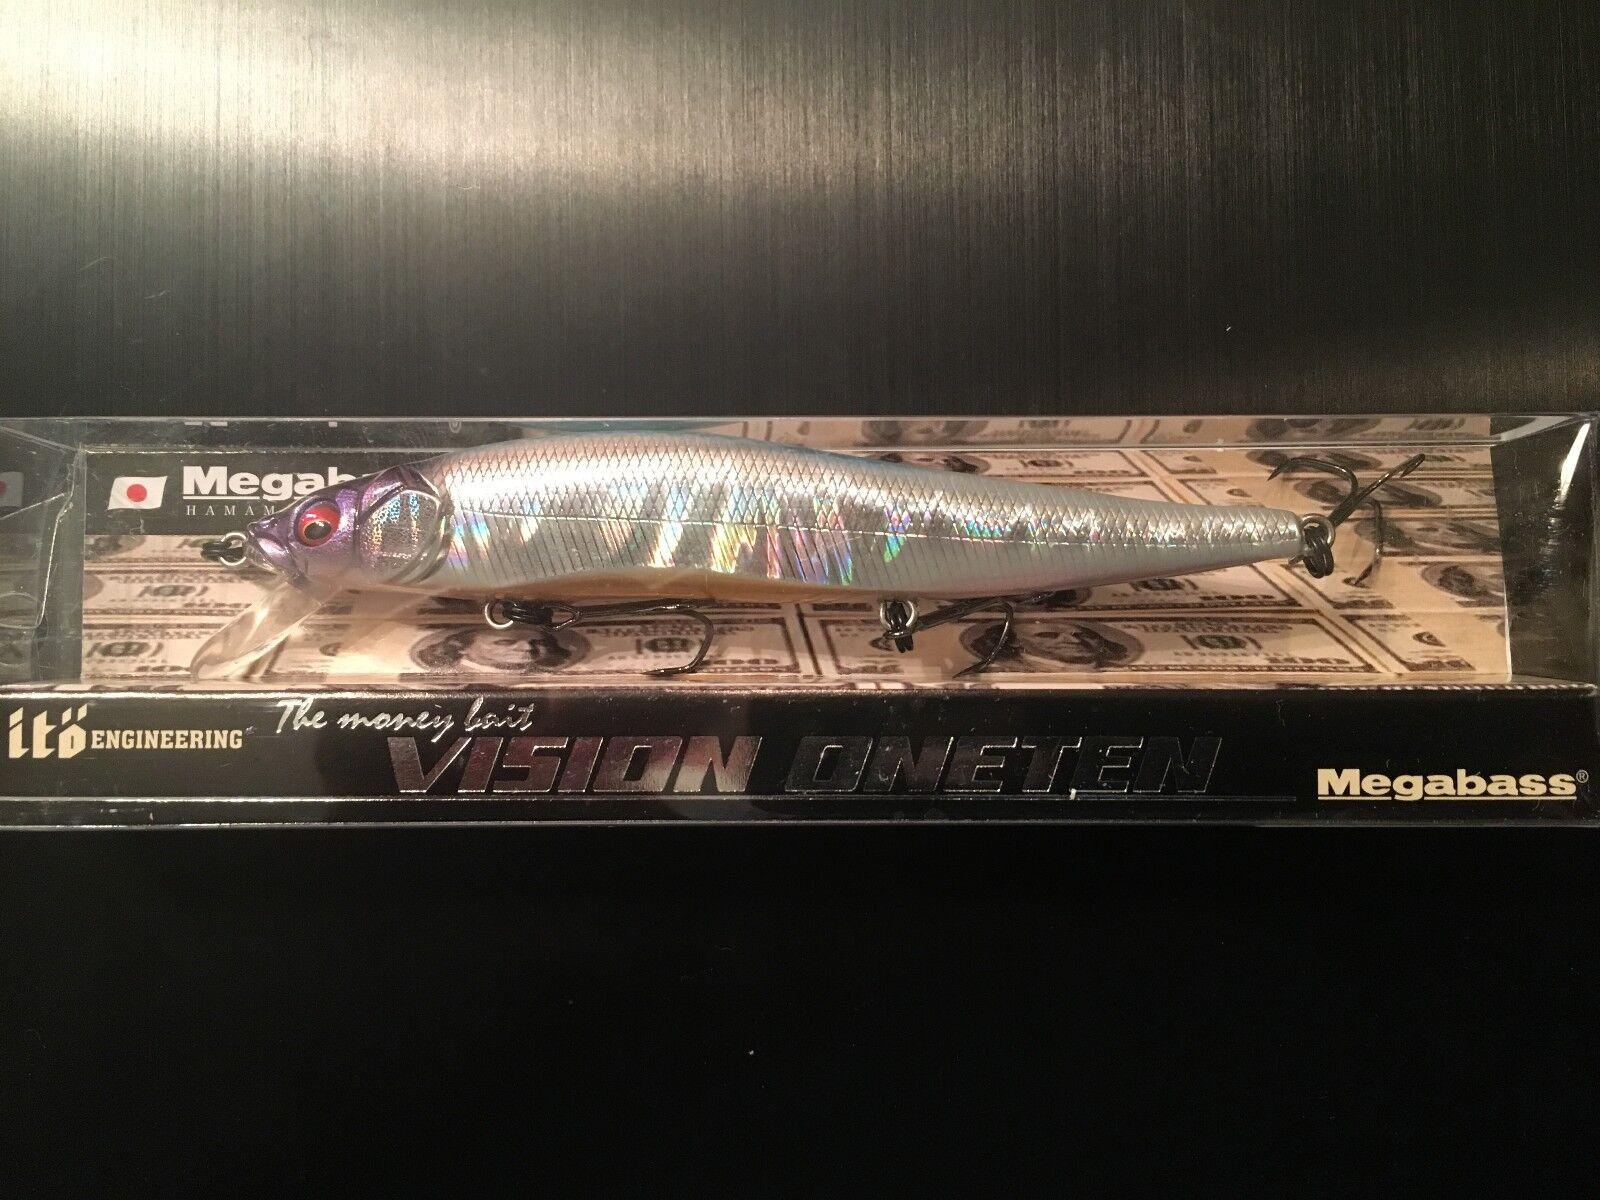 Megabass Vision 110 OneTen  Nanko Reaction NIB super rare  new products novelty items